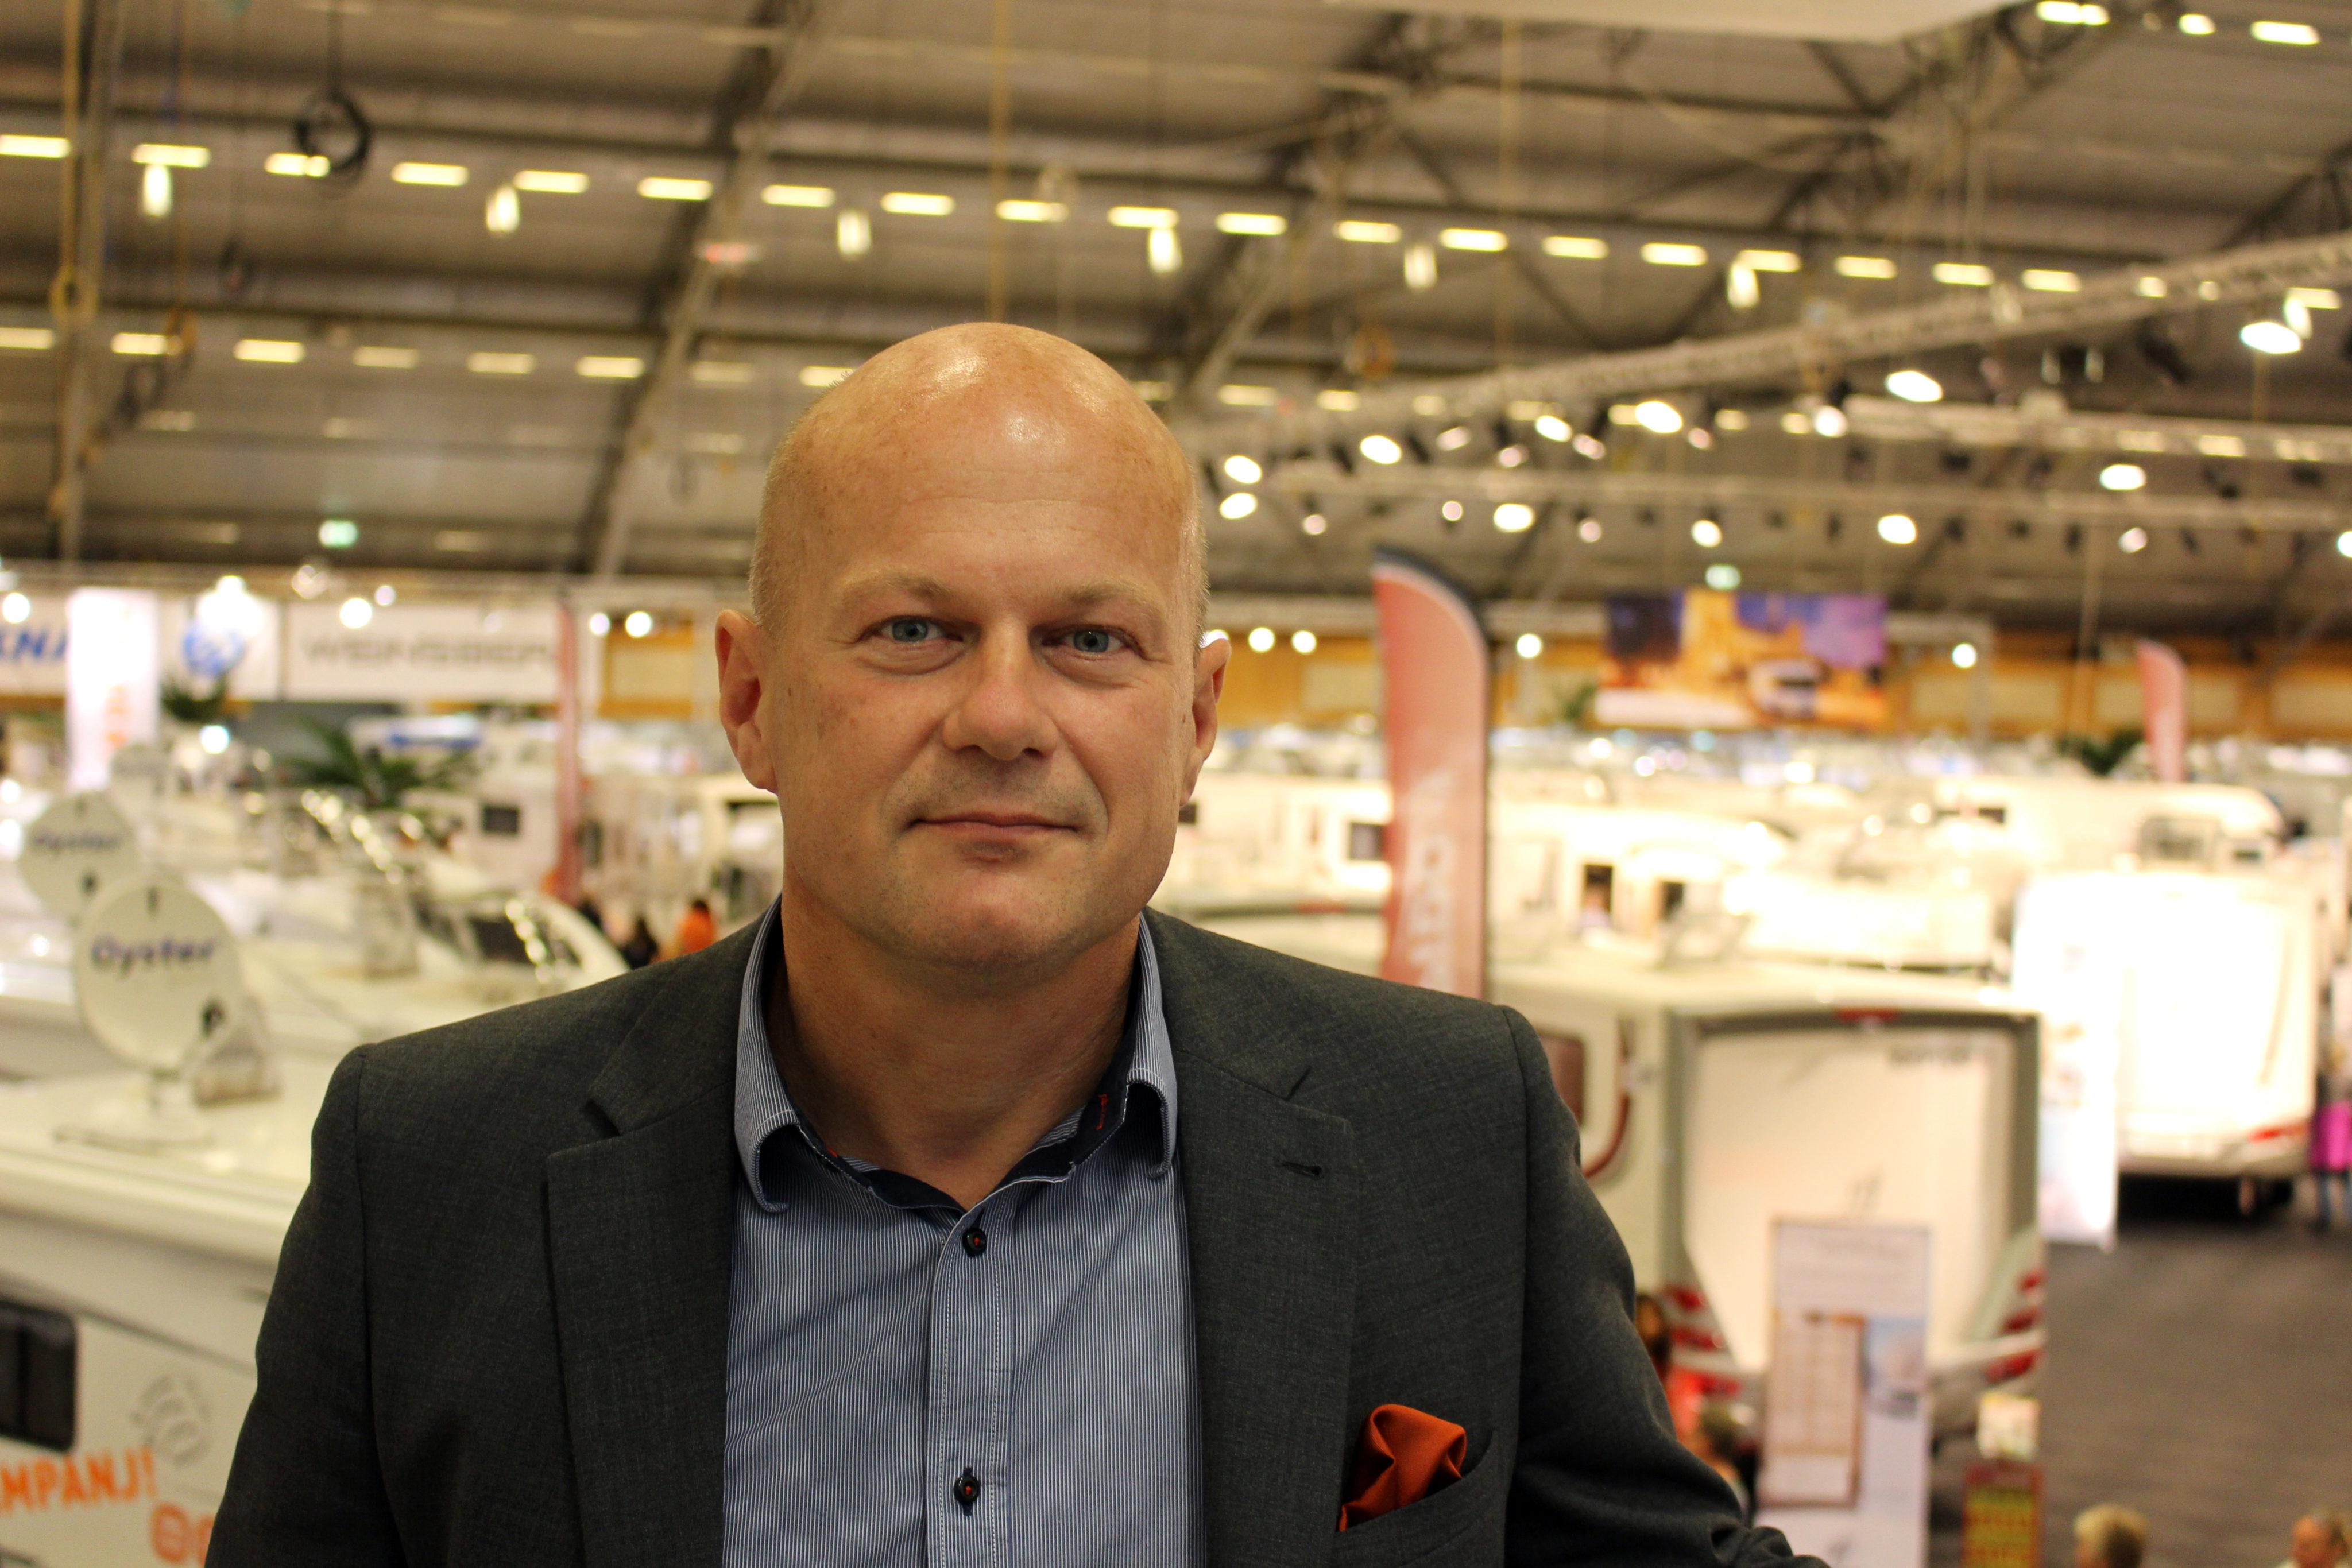 Mikael Jansson lämnar SD - Nyheter (Ekot) | Sveriges Radio